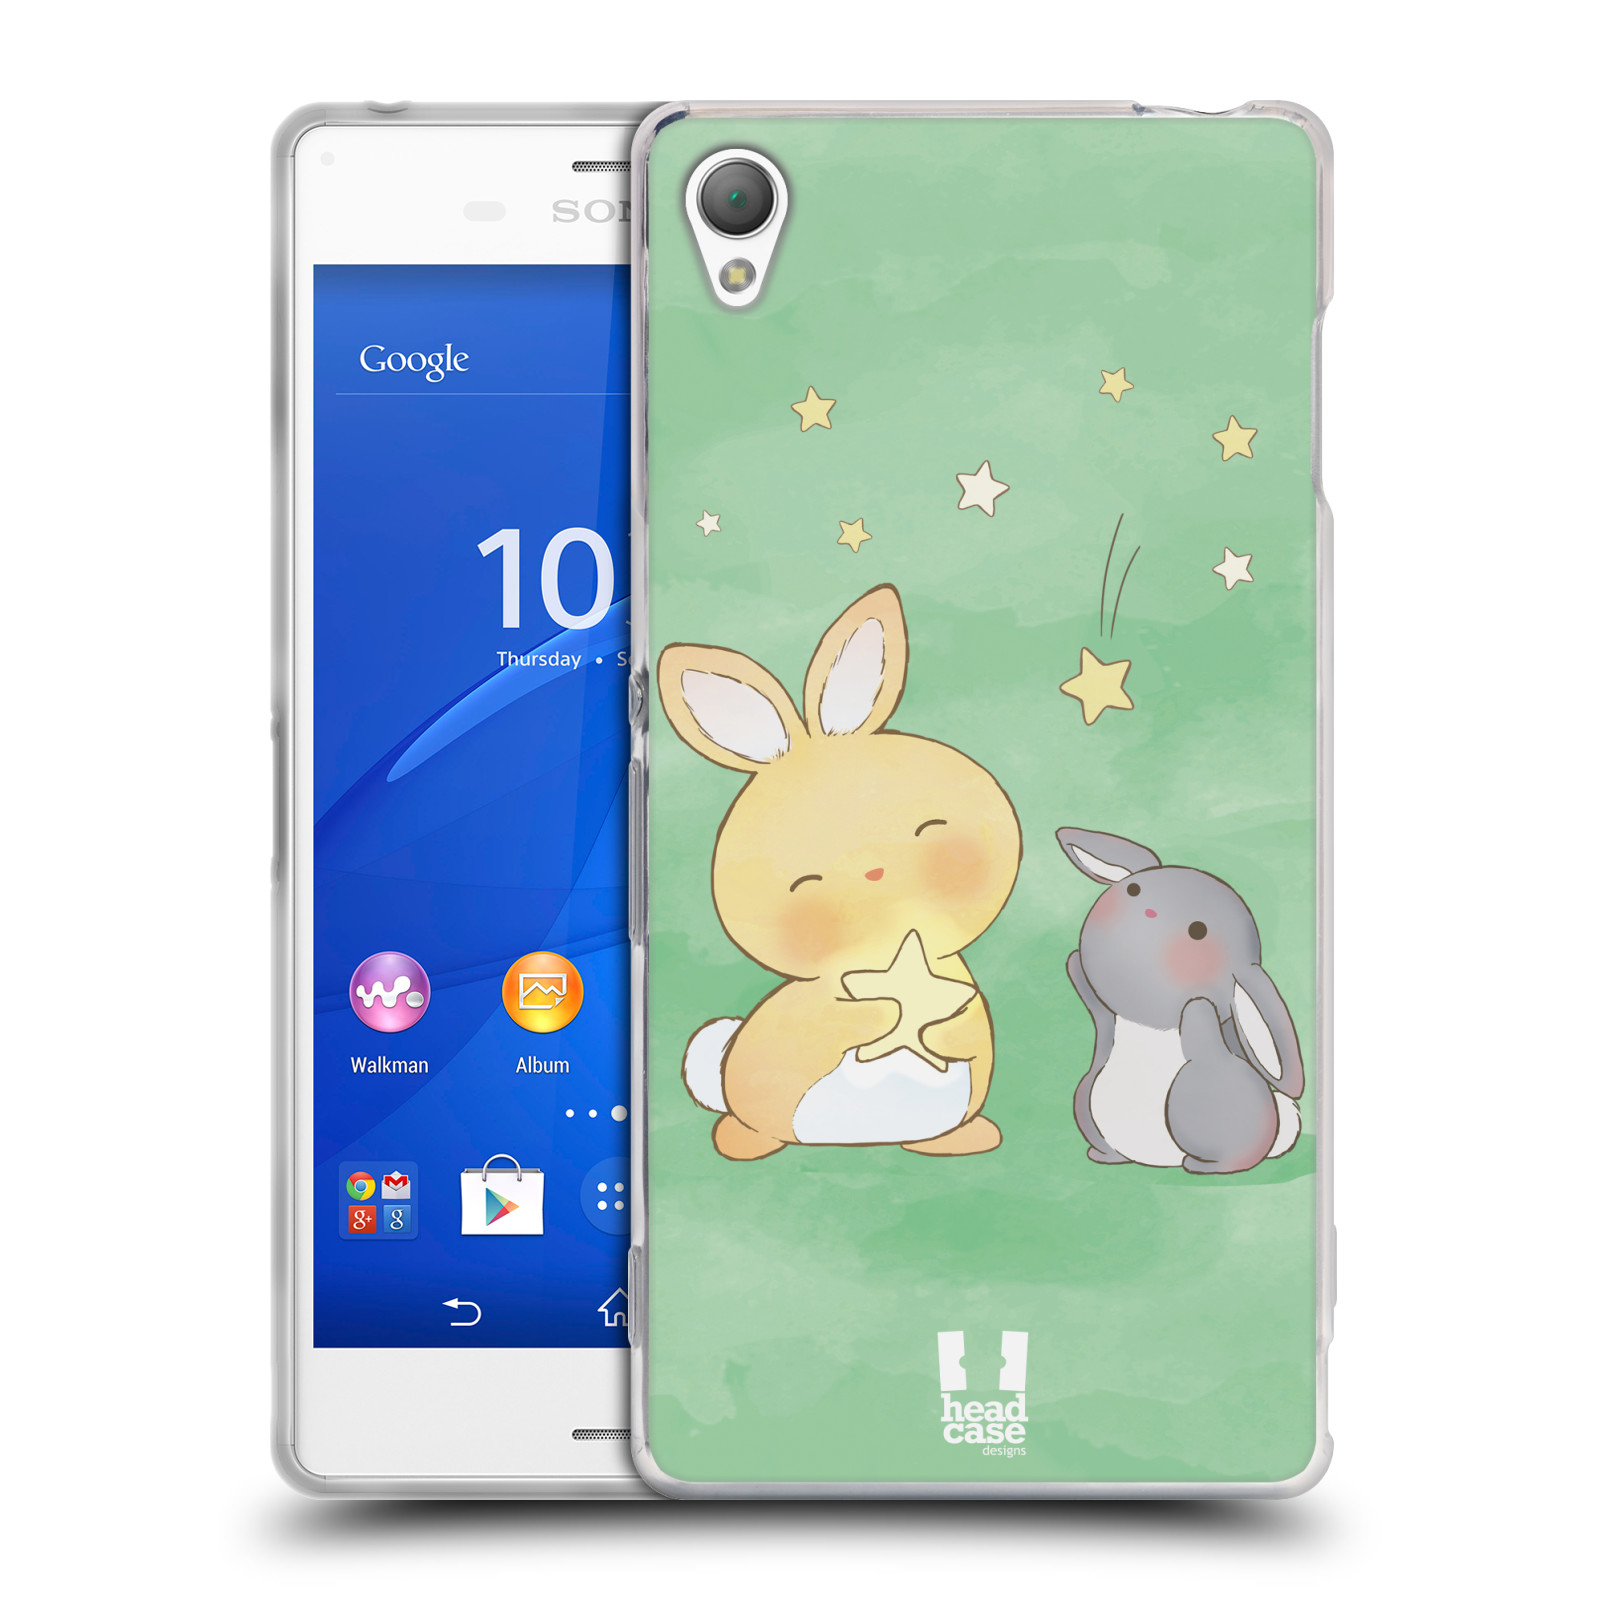 HEAD CASE silikonový obal na mobil Sony Xperia Z3 vzor králíček a hvězdy zelená